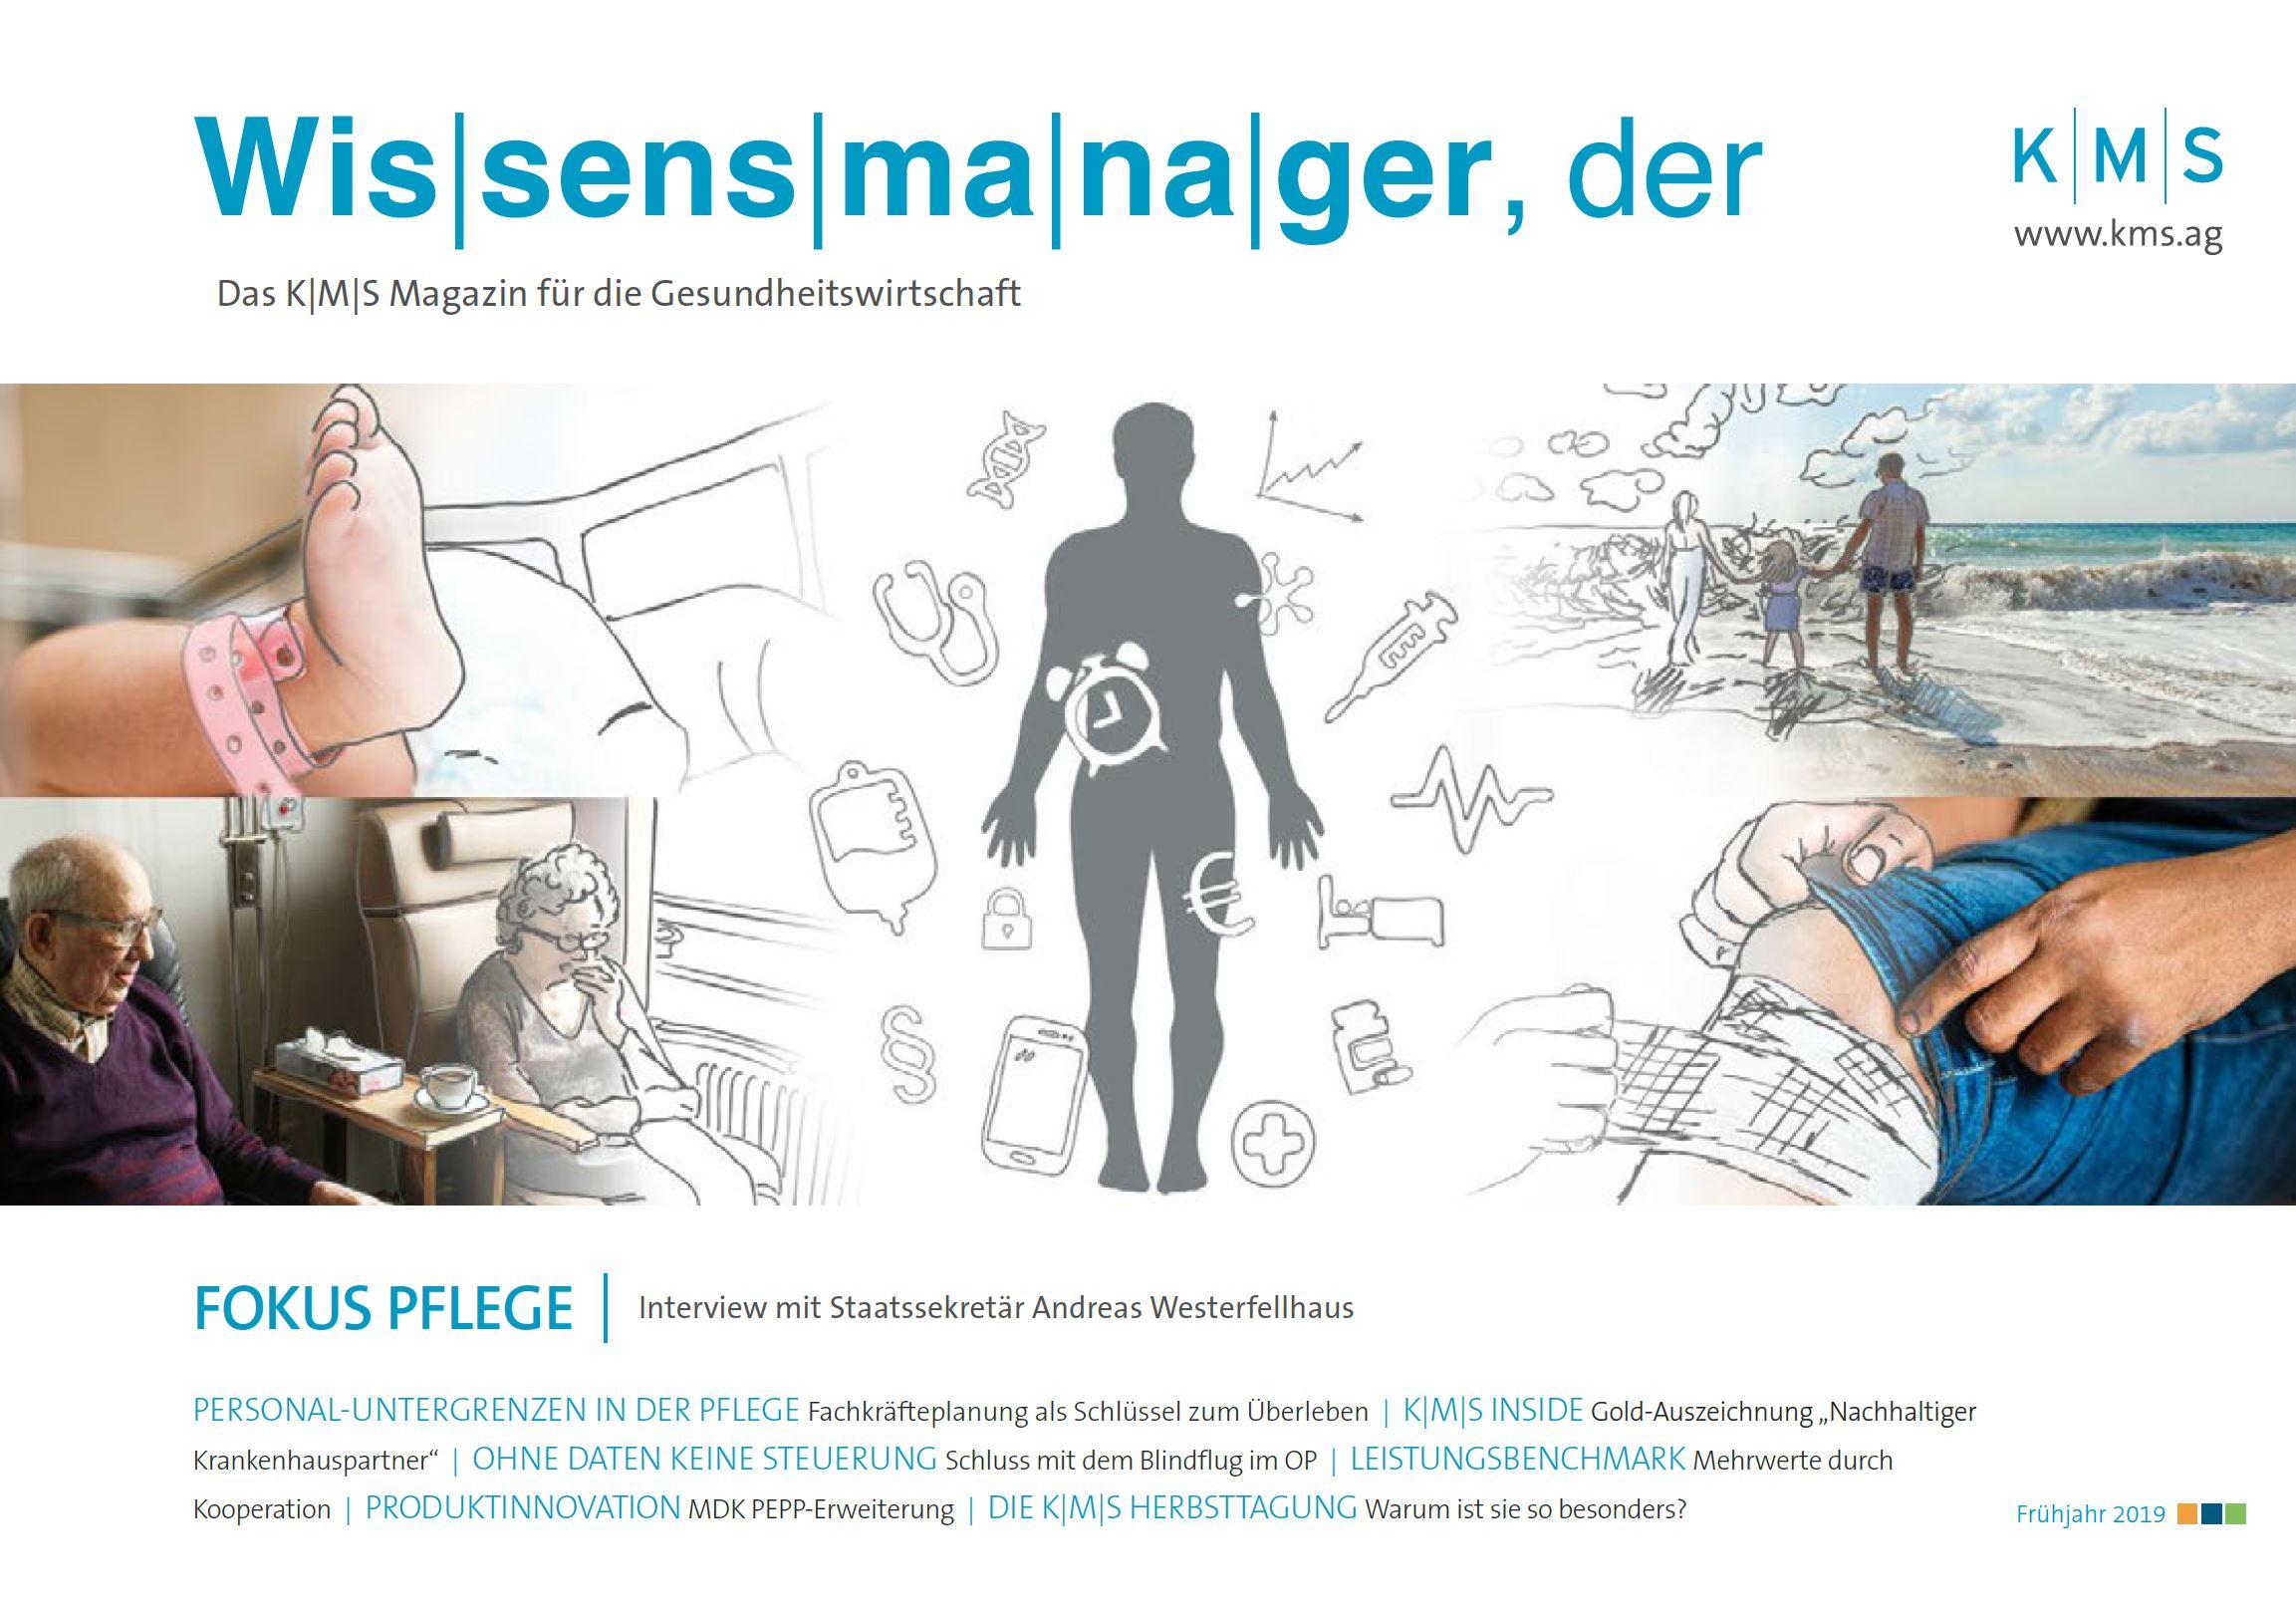 WM4-Titelblatt.JPG